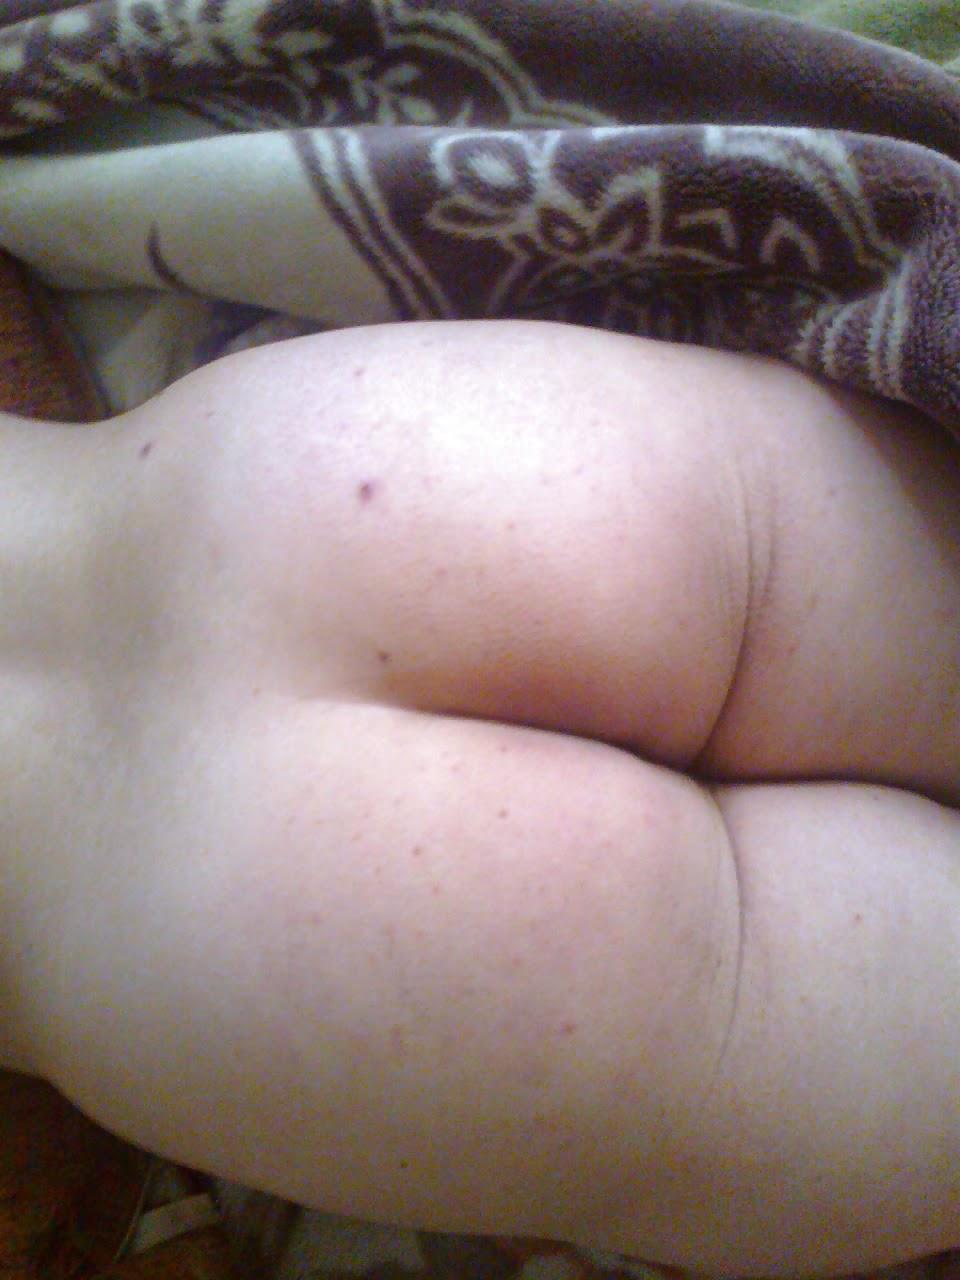 Mobil Porno Film izle Bedava Porno Sex Videoları